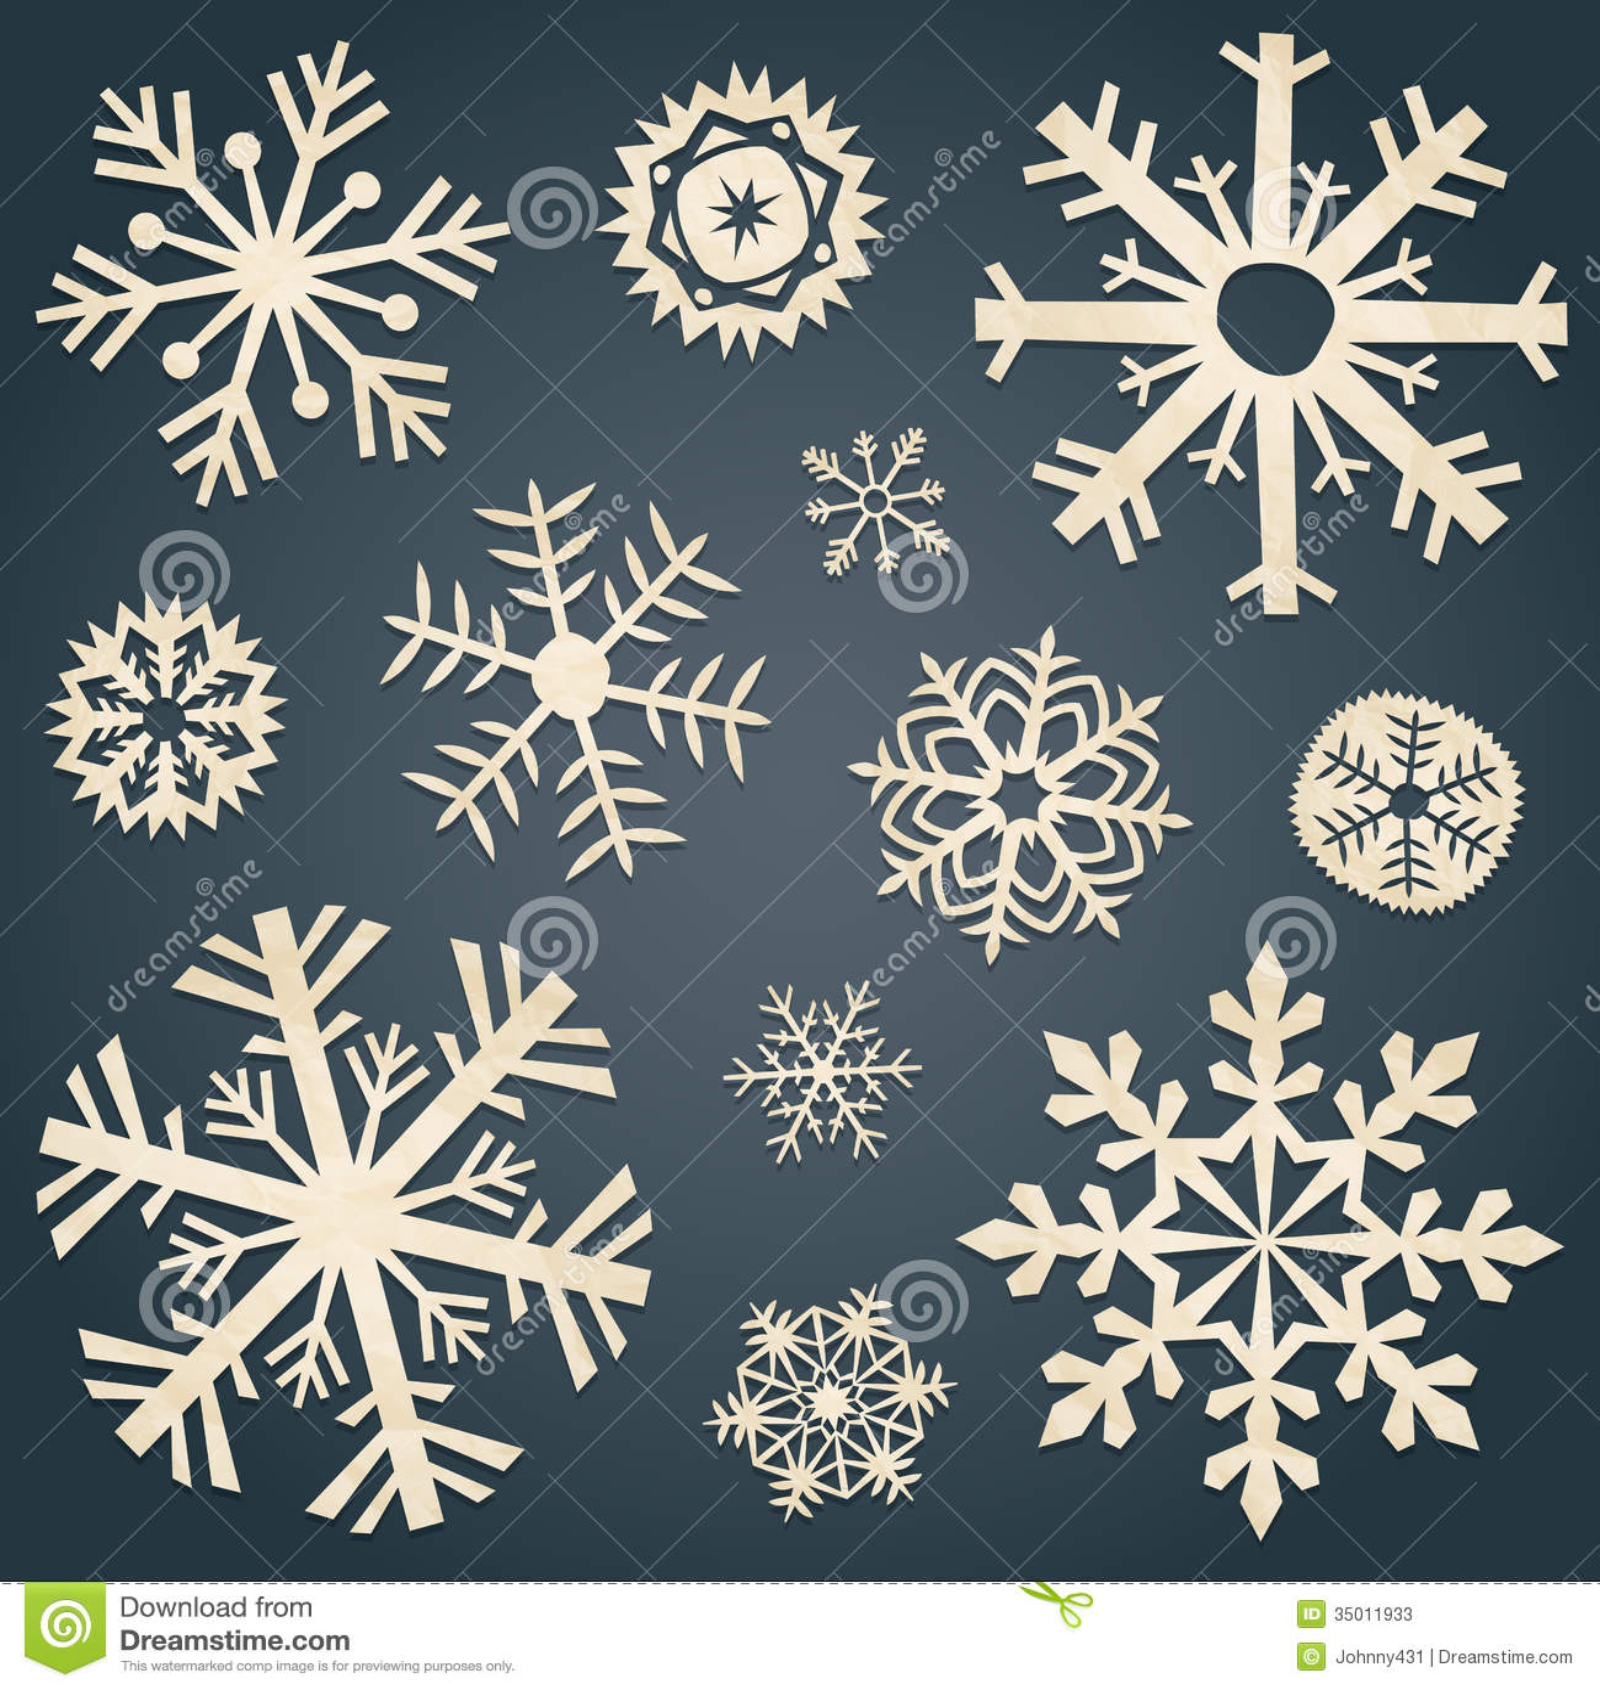 Pin copos nieve de nieves tattoos tattoo designs pictures - Copos de nieve manualidades ...